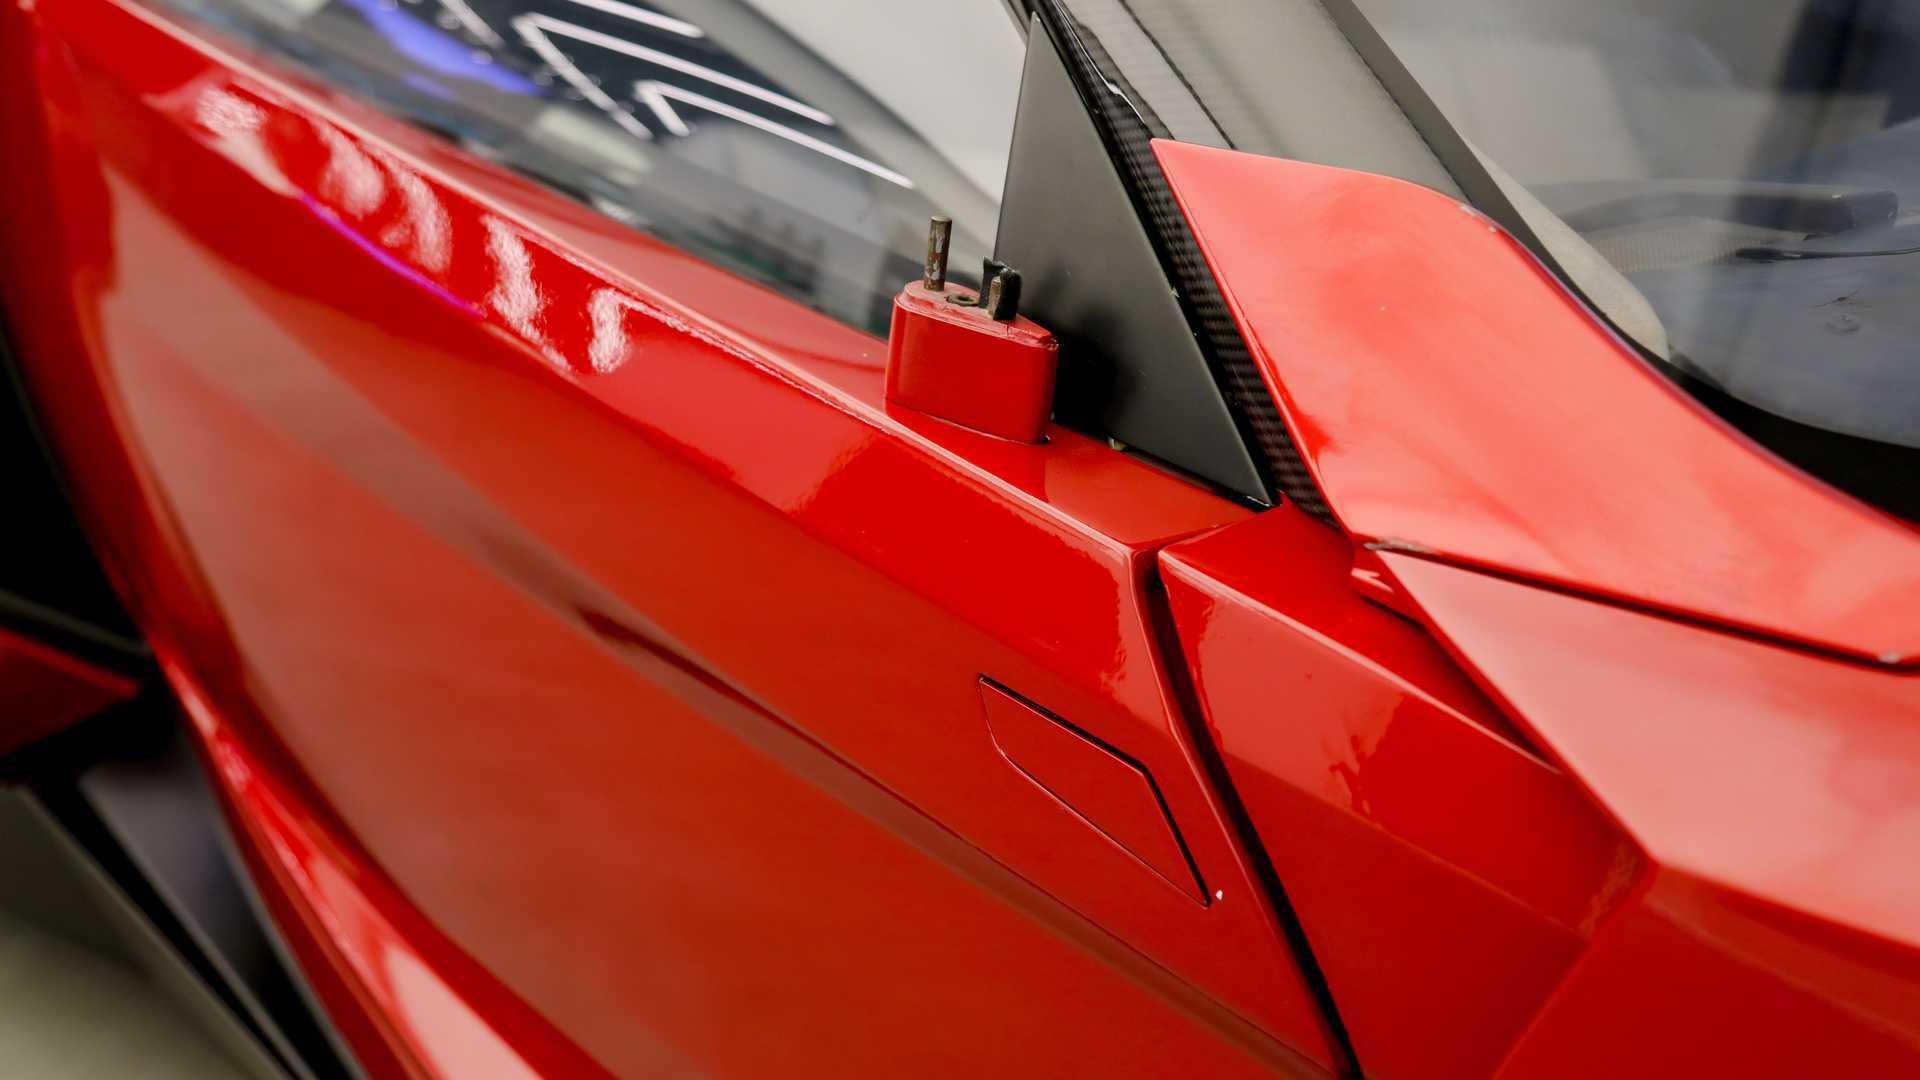 Lykan_HyperSport_stunt_car_sale-0008